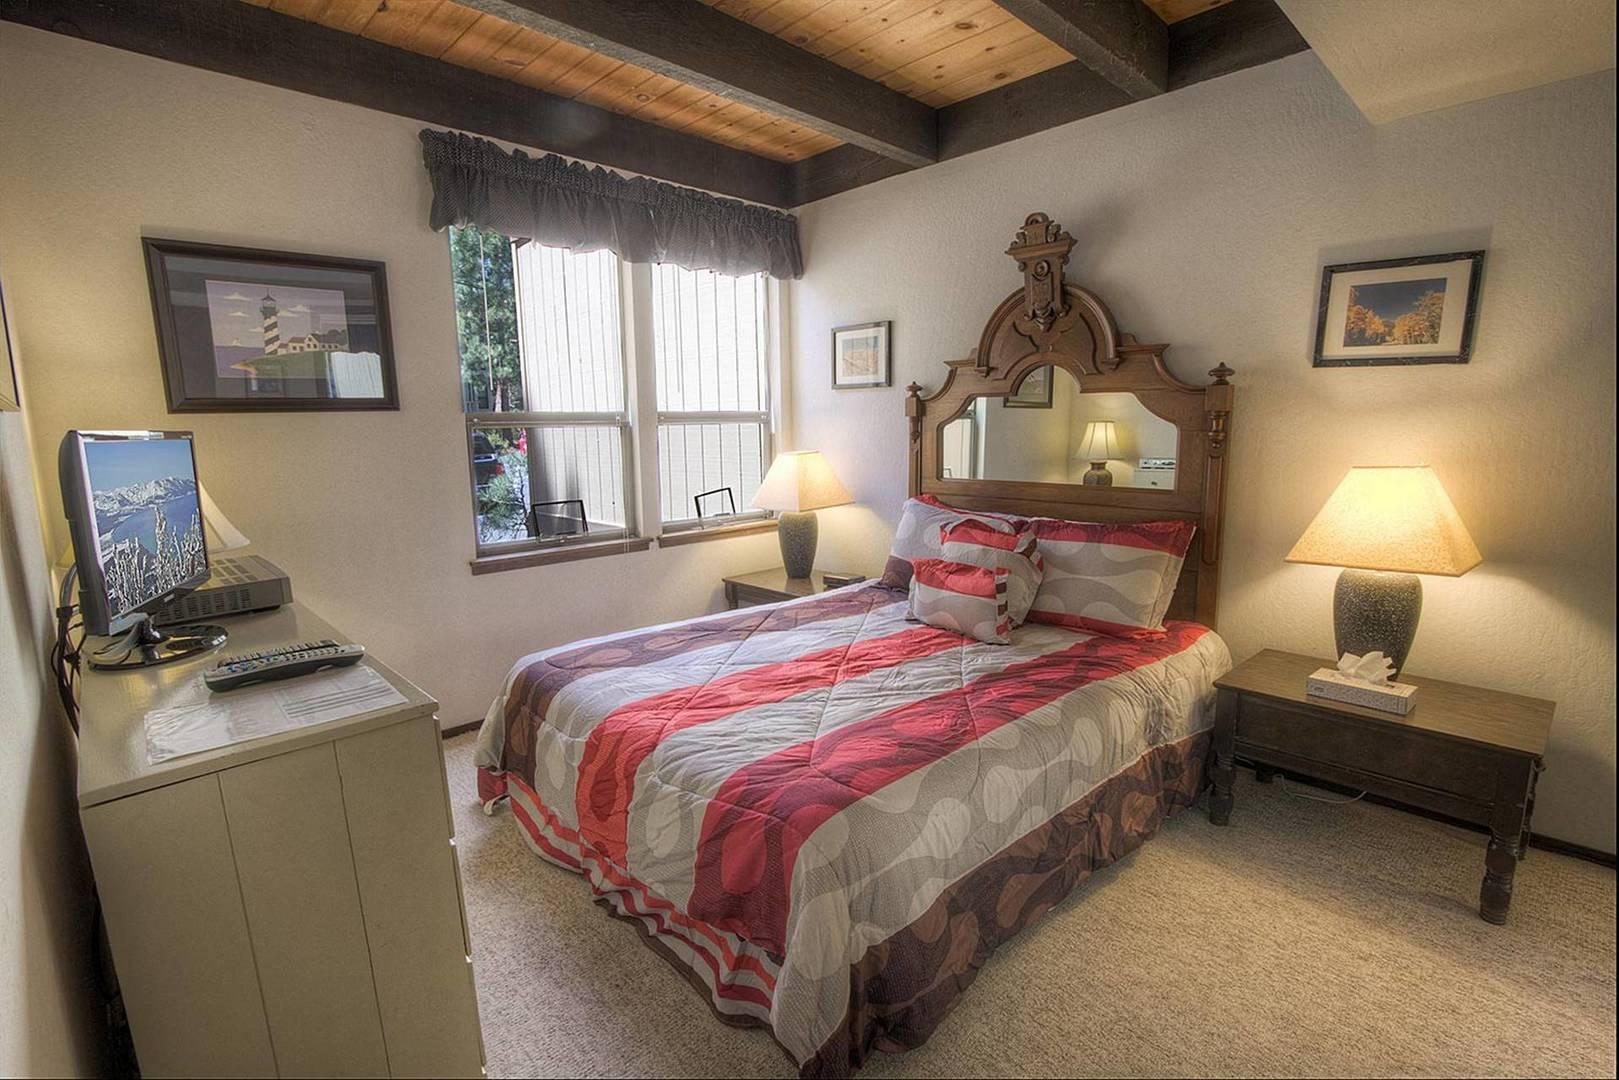 KWC0655 Bedroom